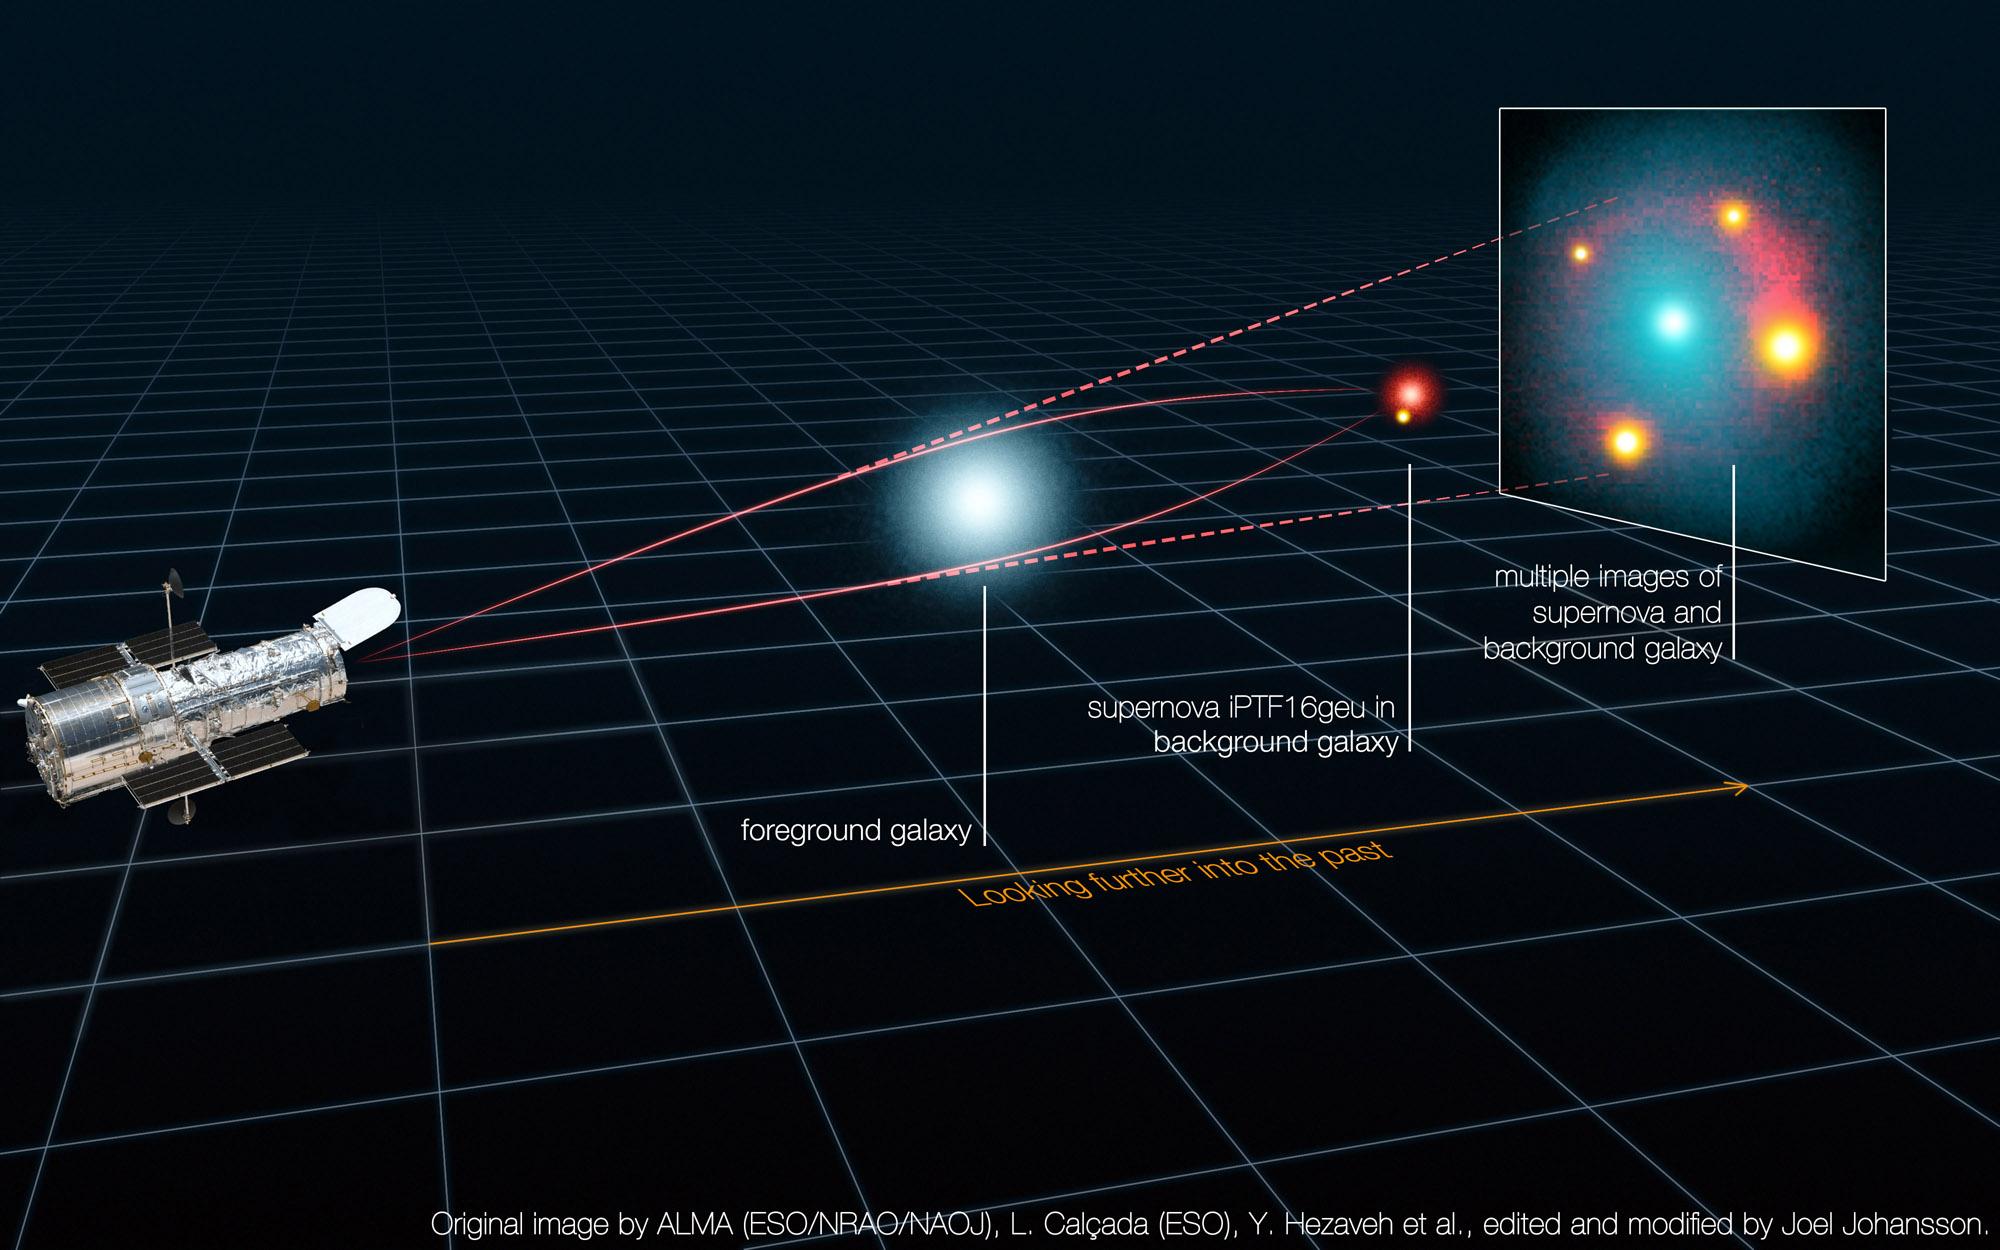 A rare quadruple star explosion